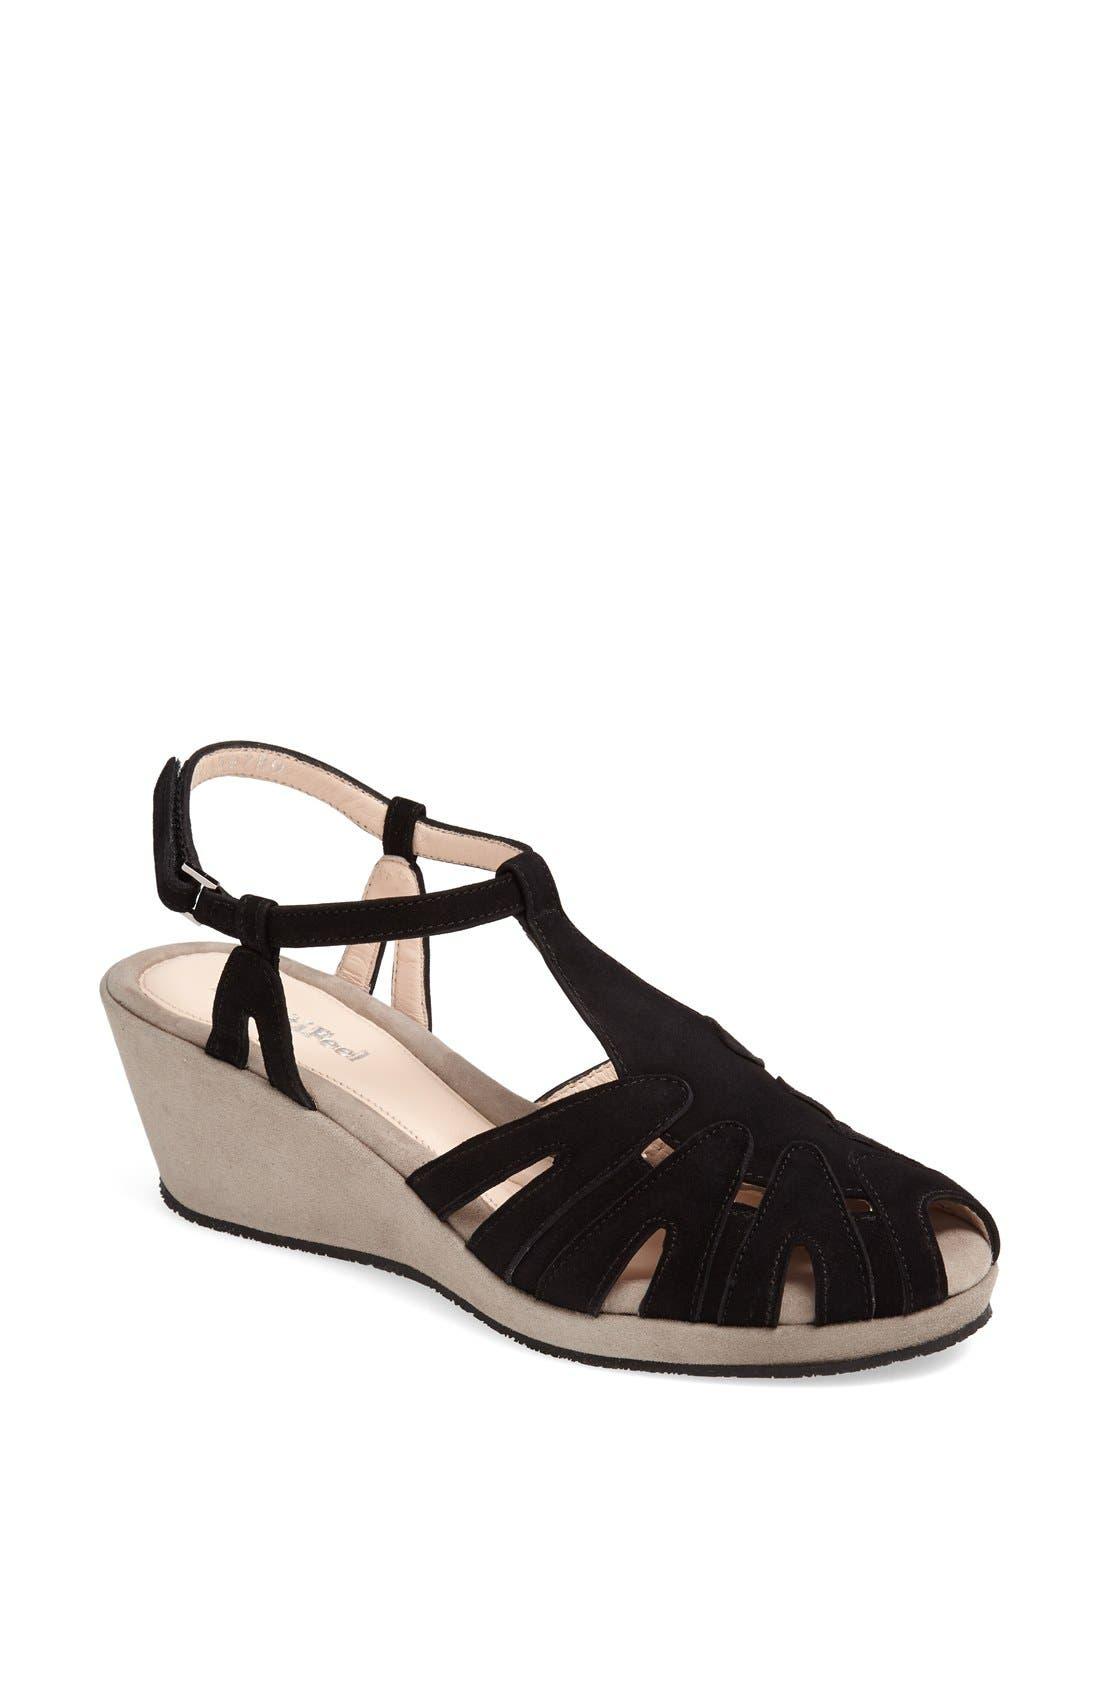 Main Image - BeautiFeel 'Candy' Sandal